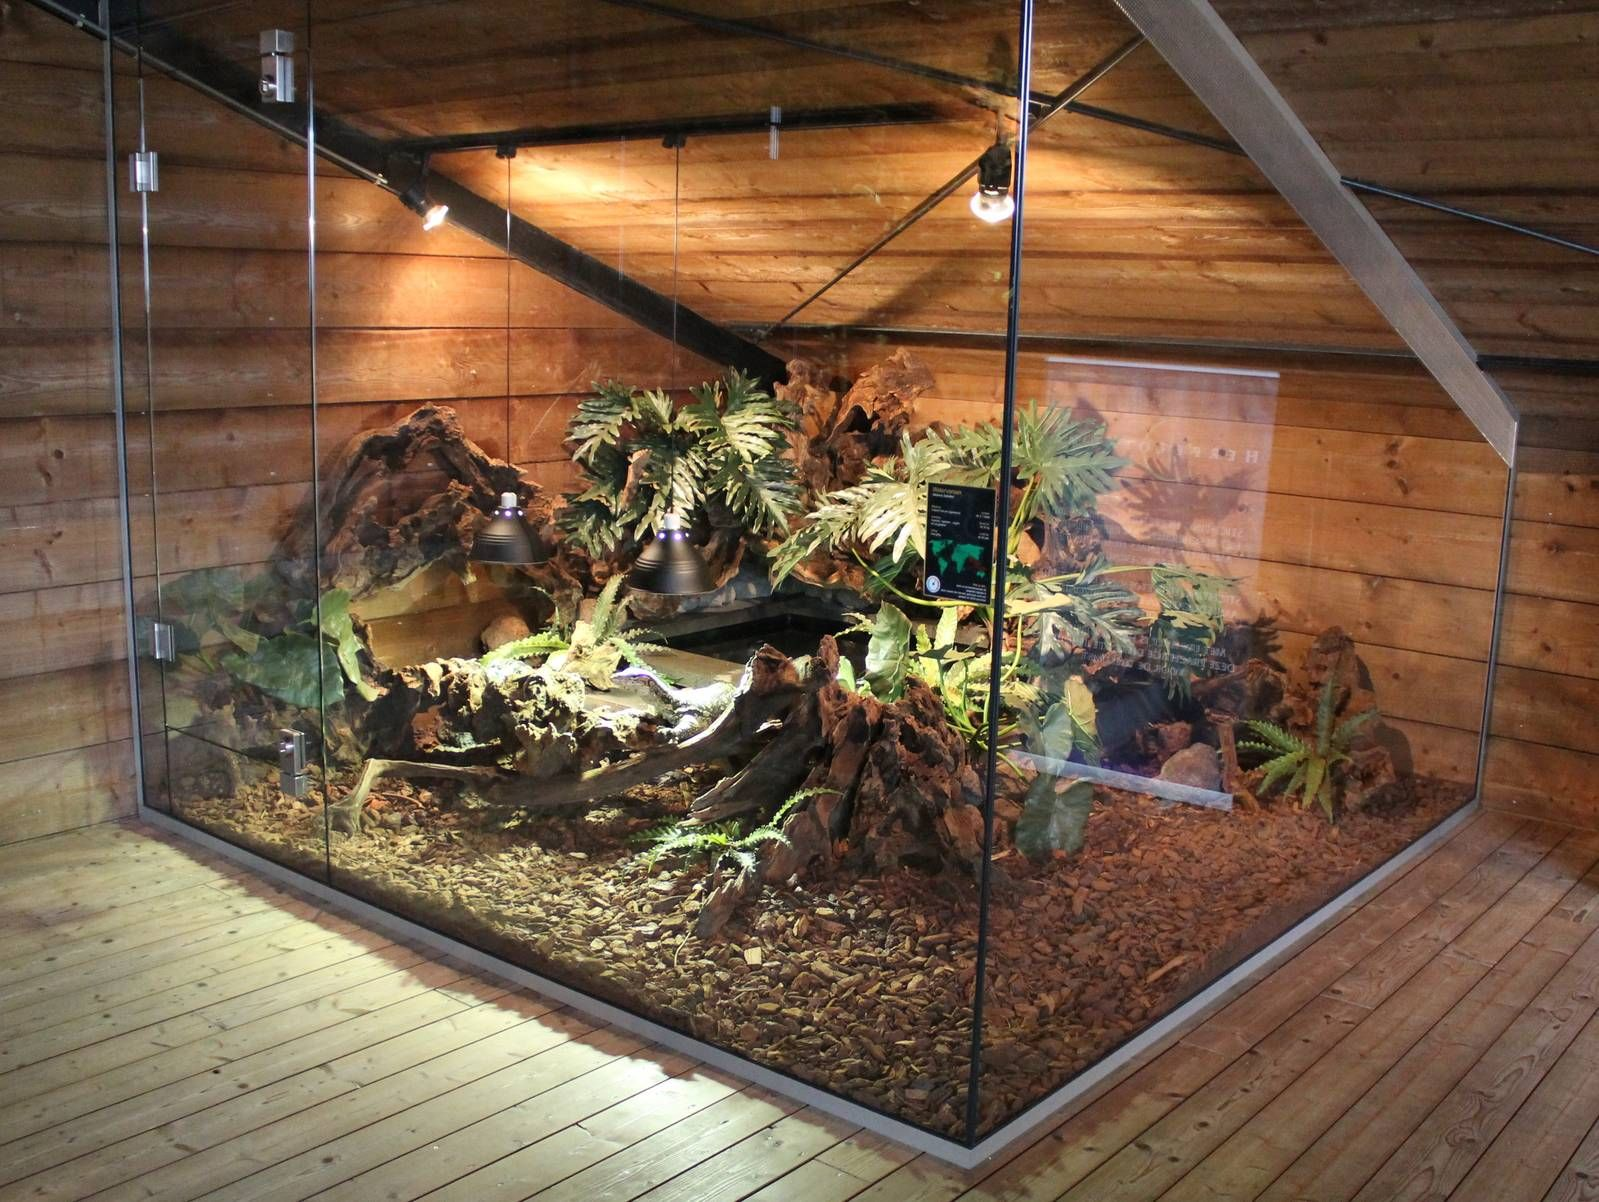 Reptile big enclosure google search enclosure ideas pinterest